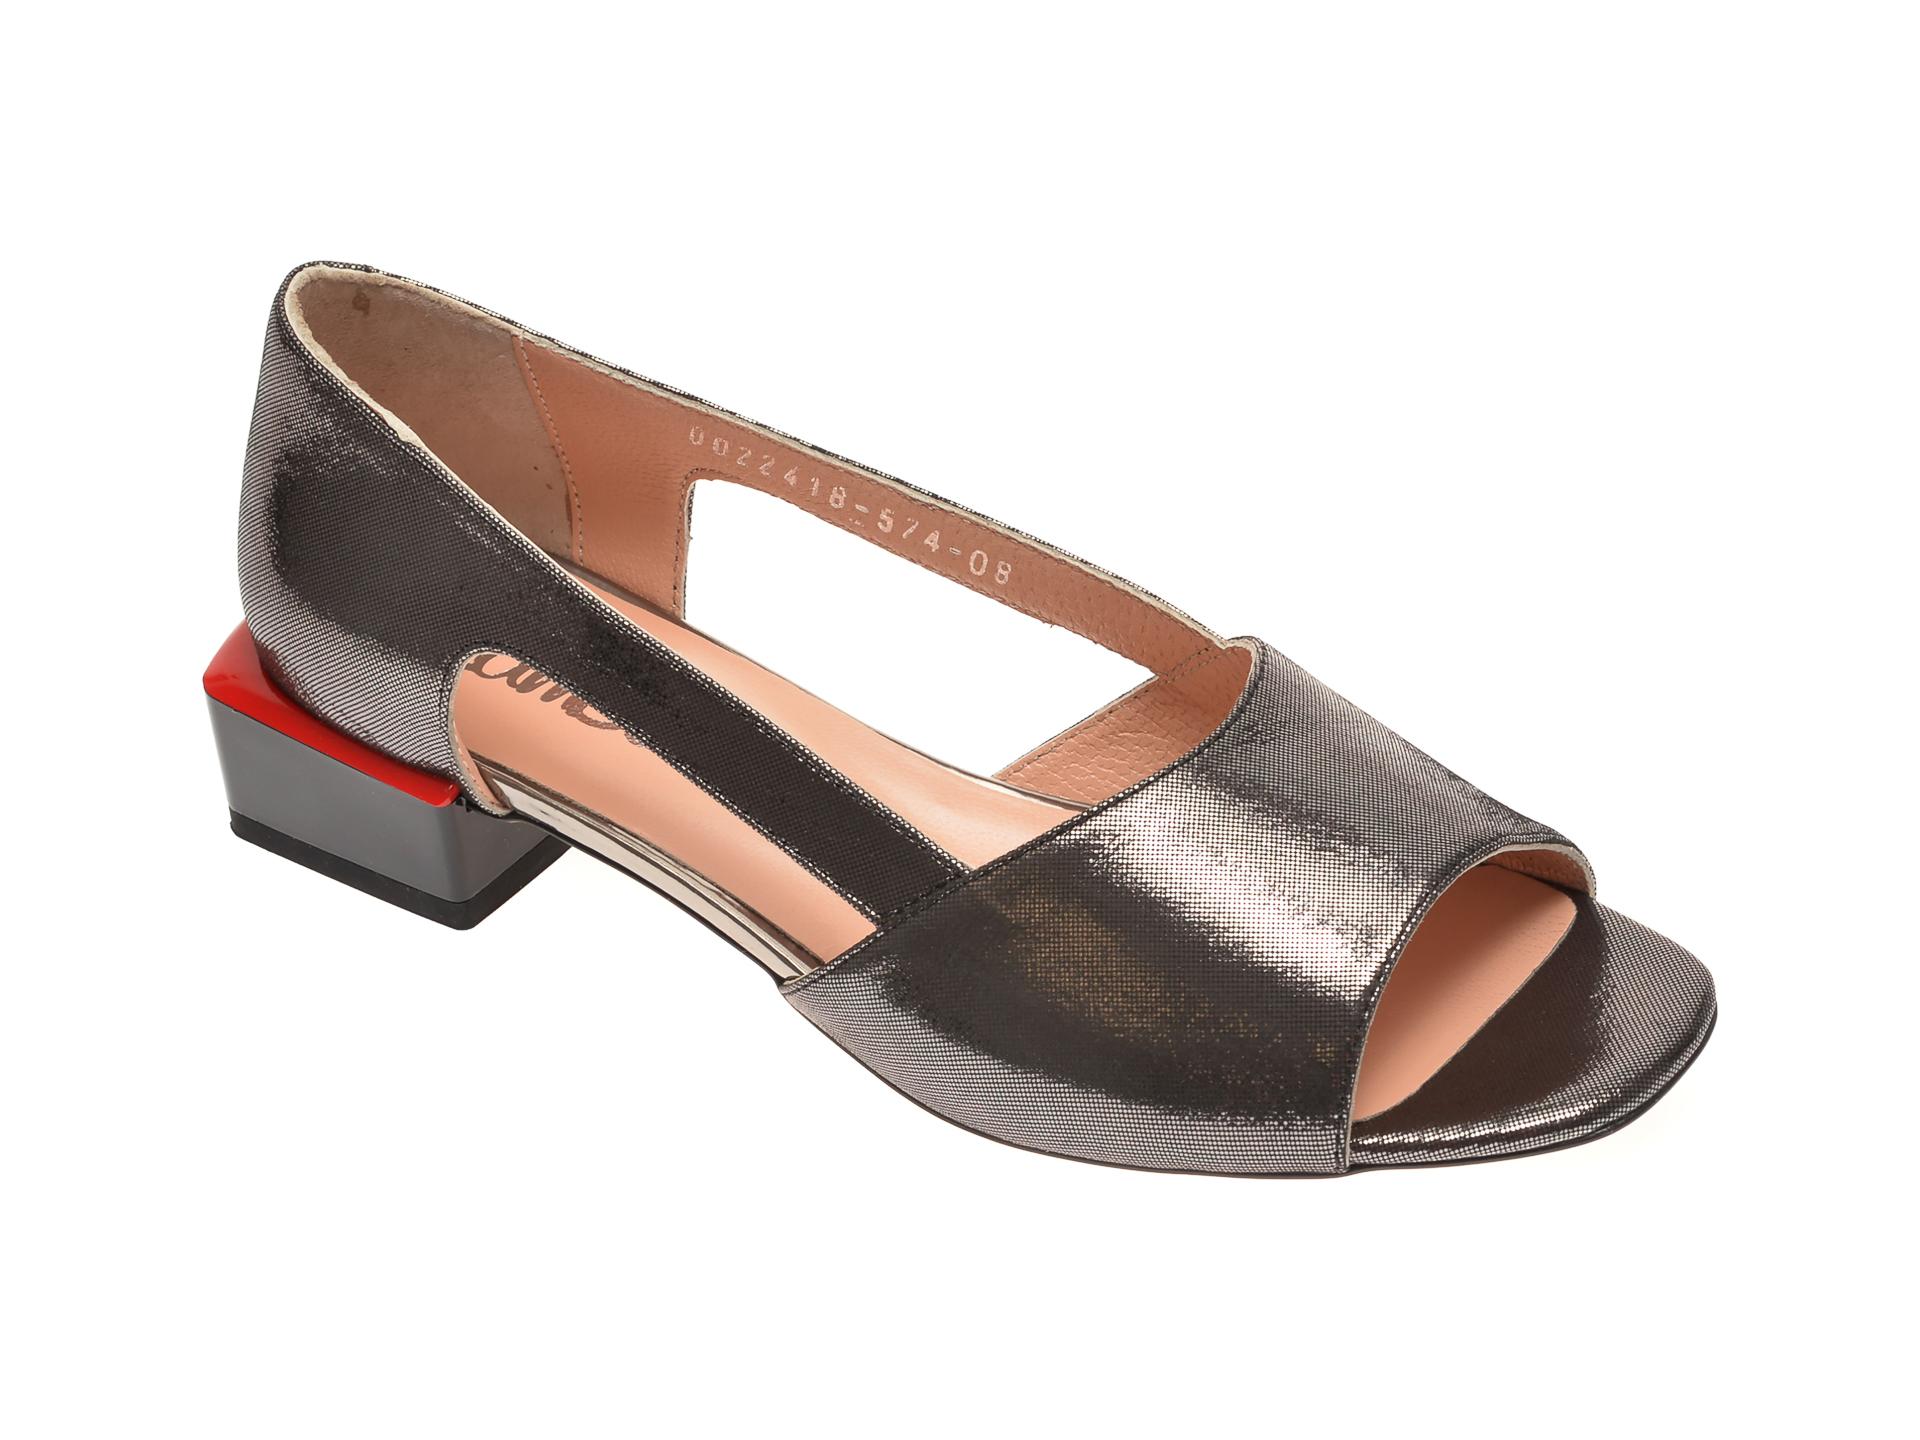 Sandale MISS LIZA negre, 1182418, din piele naturala New